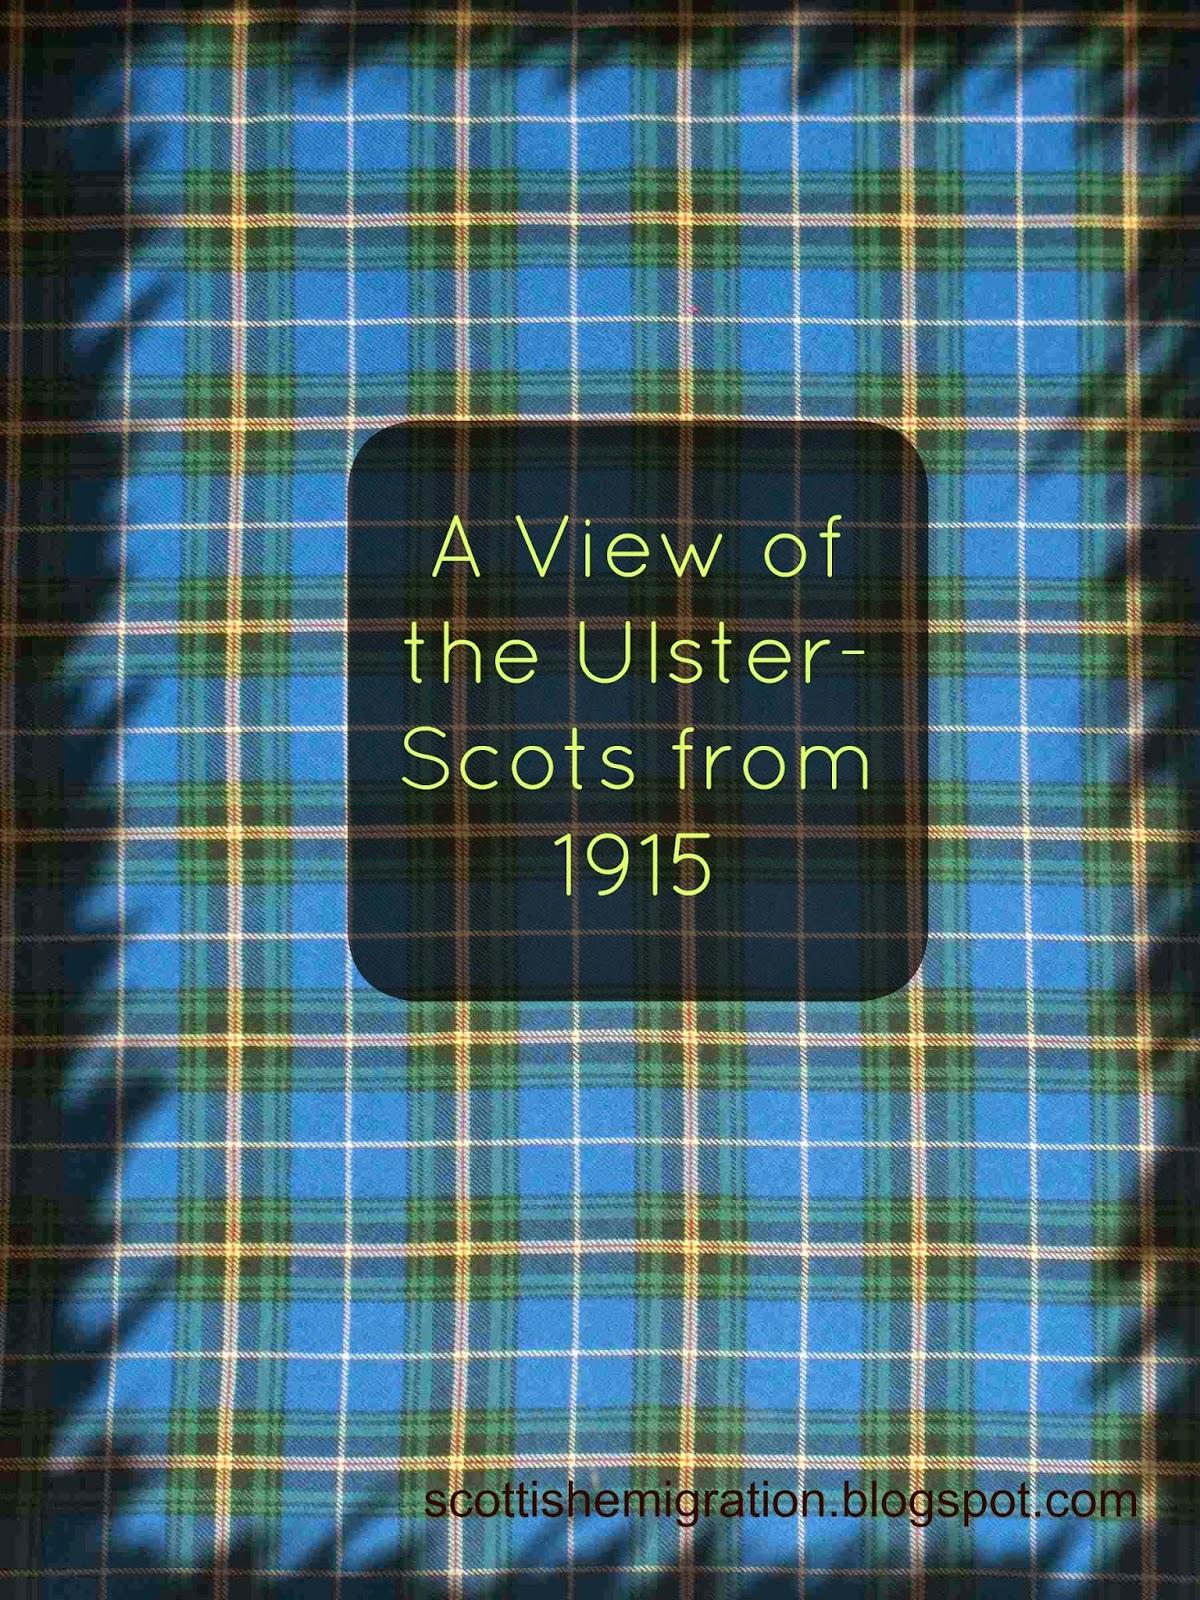 ulster-scots, scotch-irish, immigration, emigration, scotland, ireland